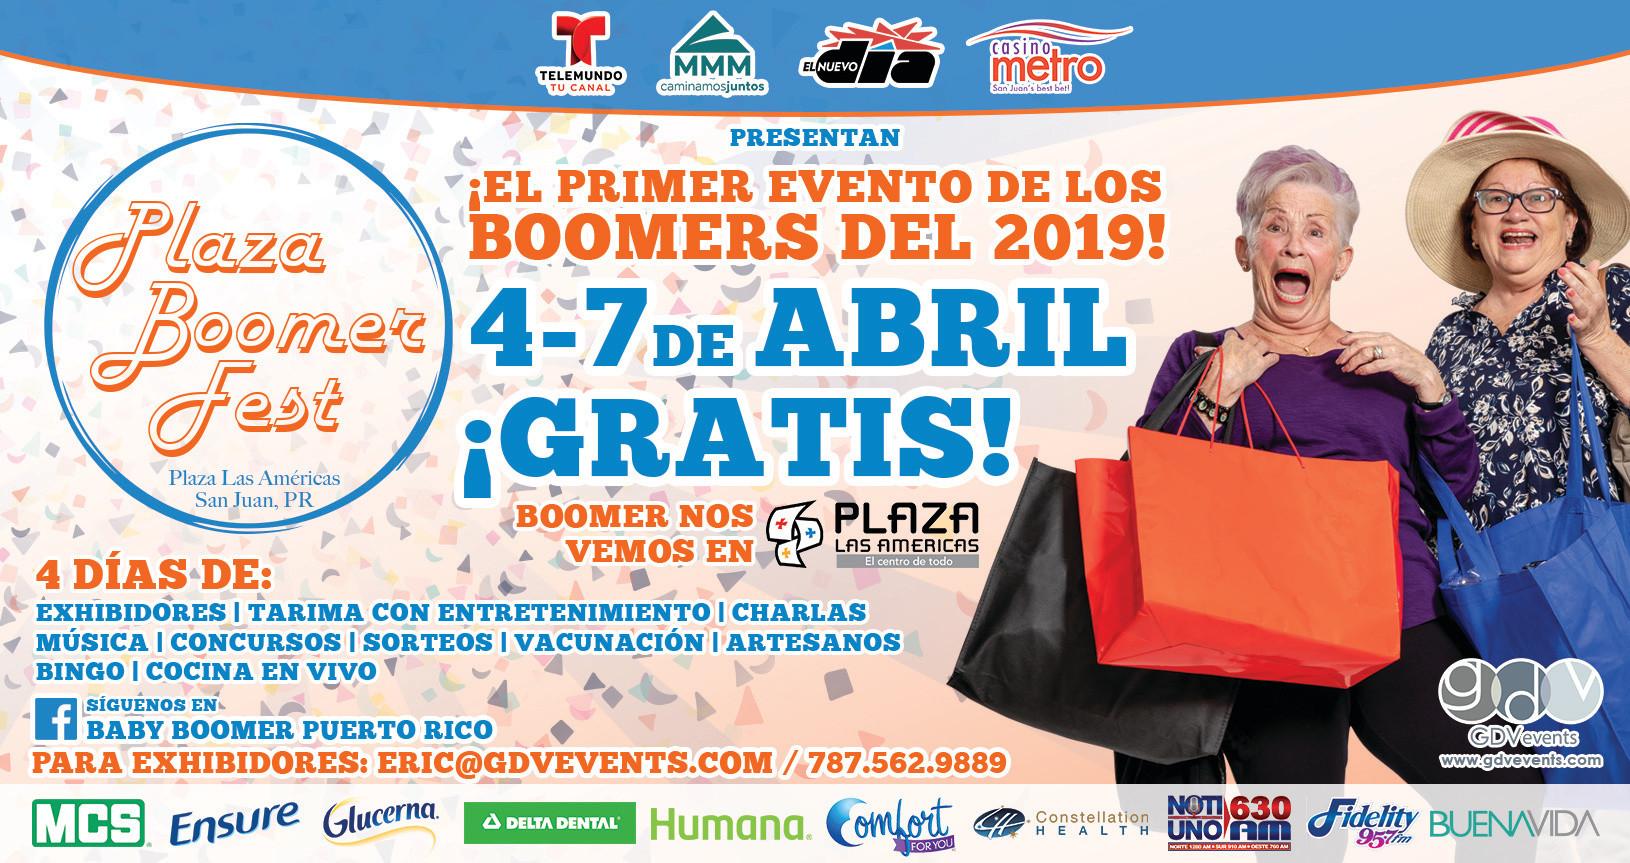 Plaza Boomer Fest | Half Page